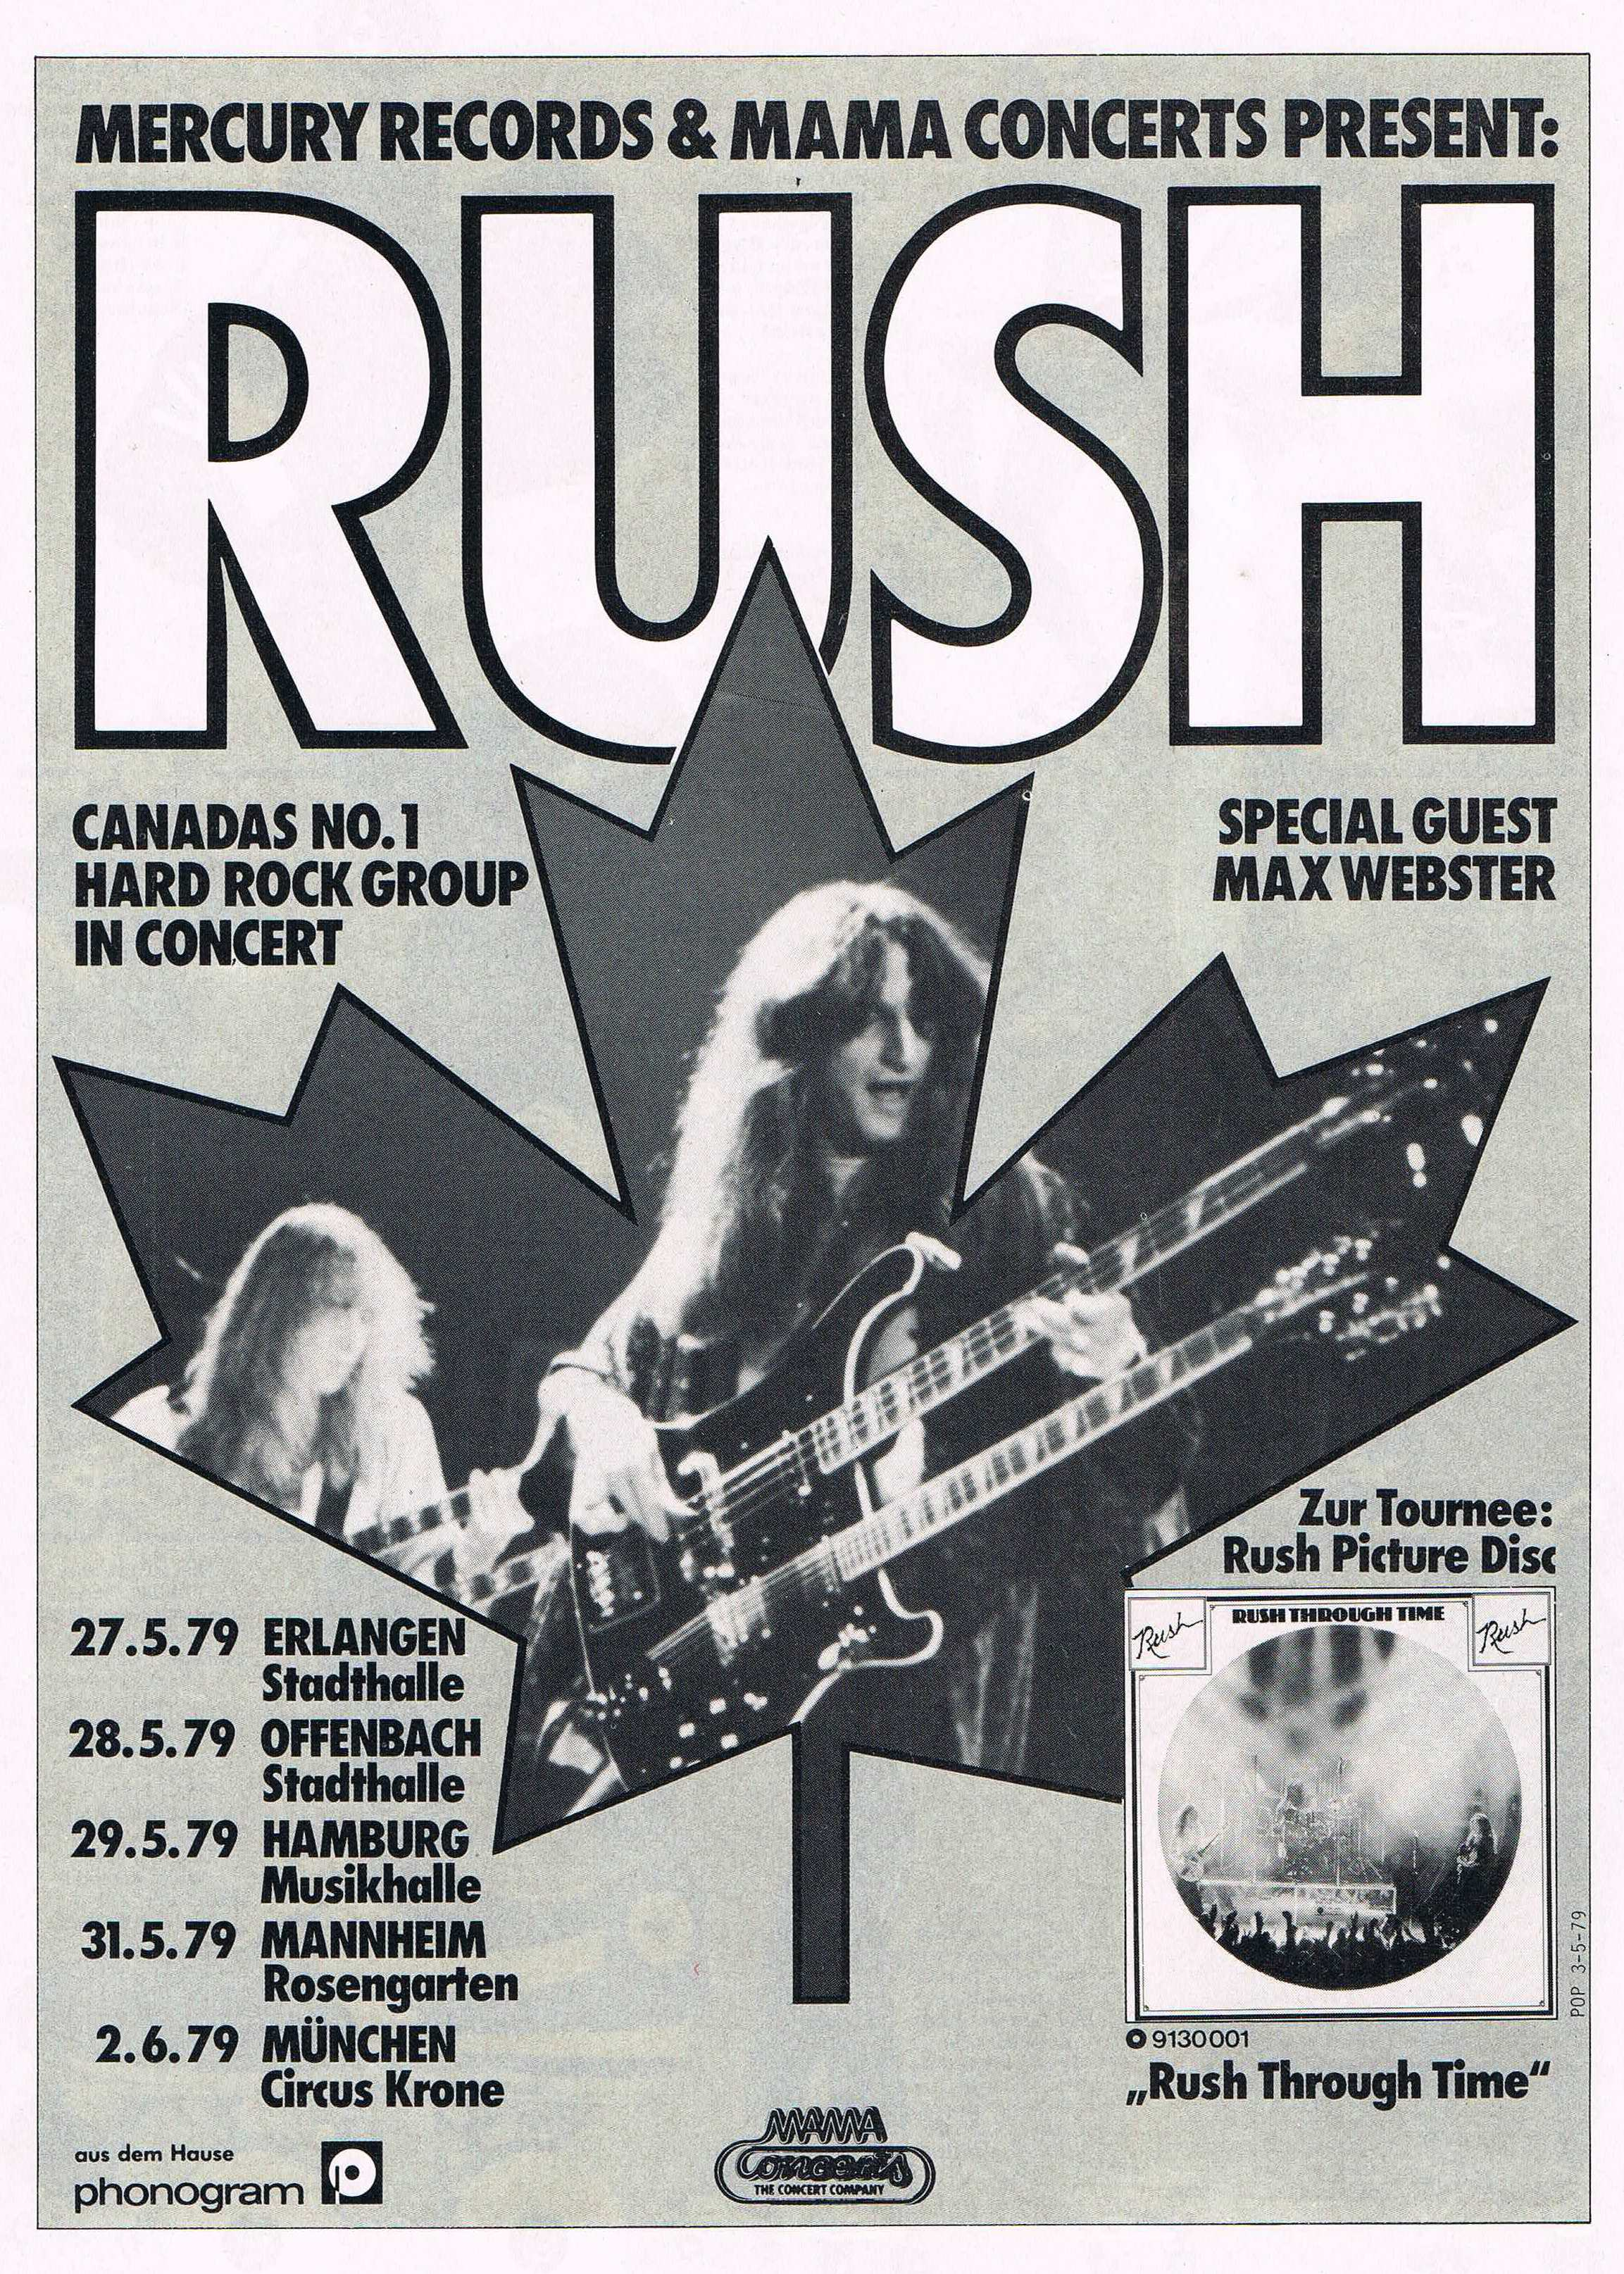 Rush Concert Wallpaper The European 'rush Through